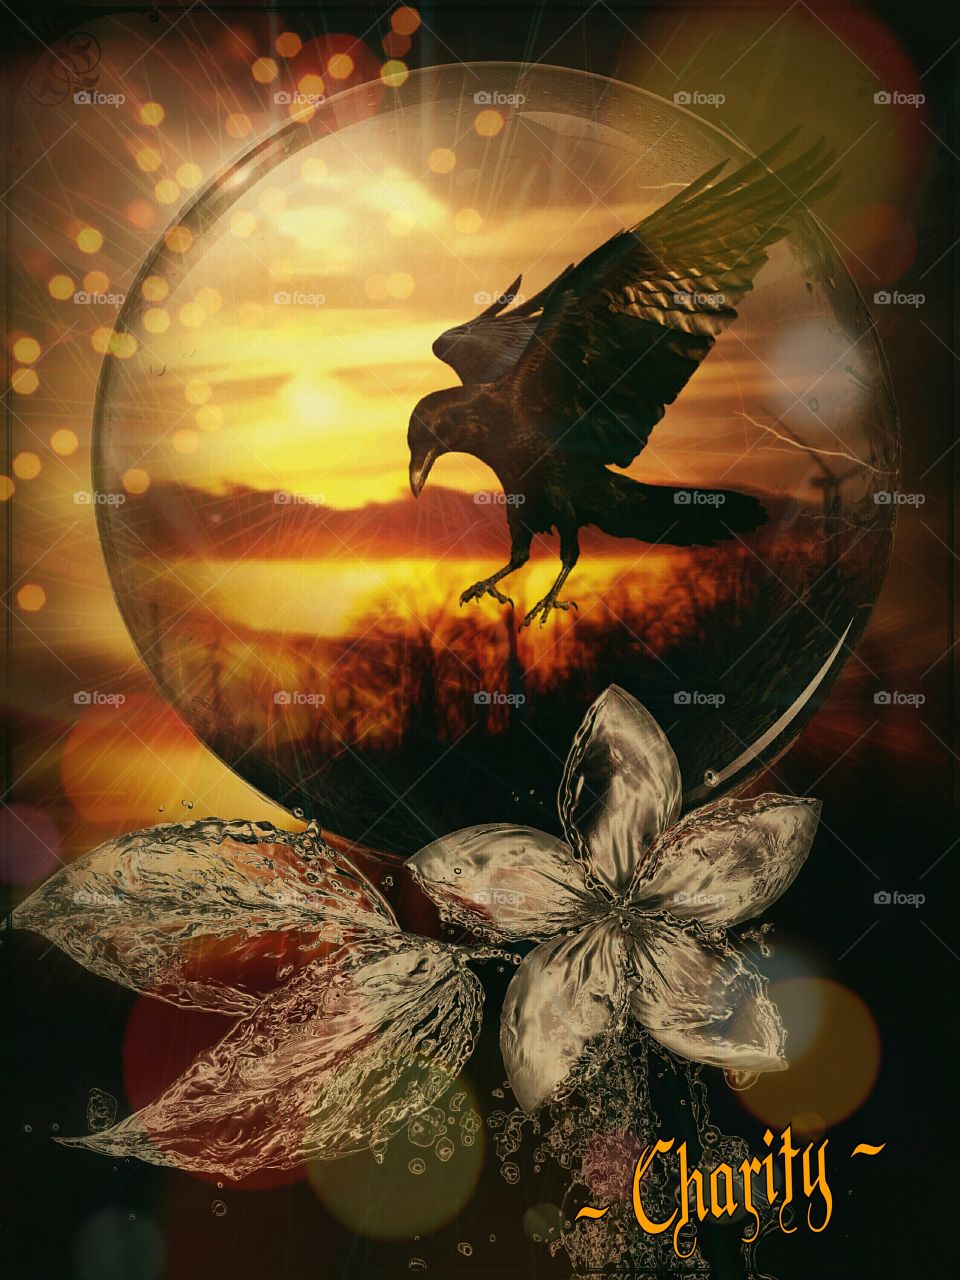 digital art creation of bird and sunset